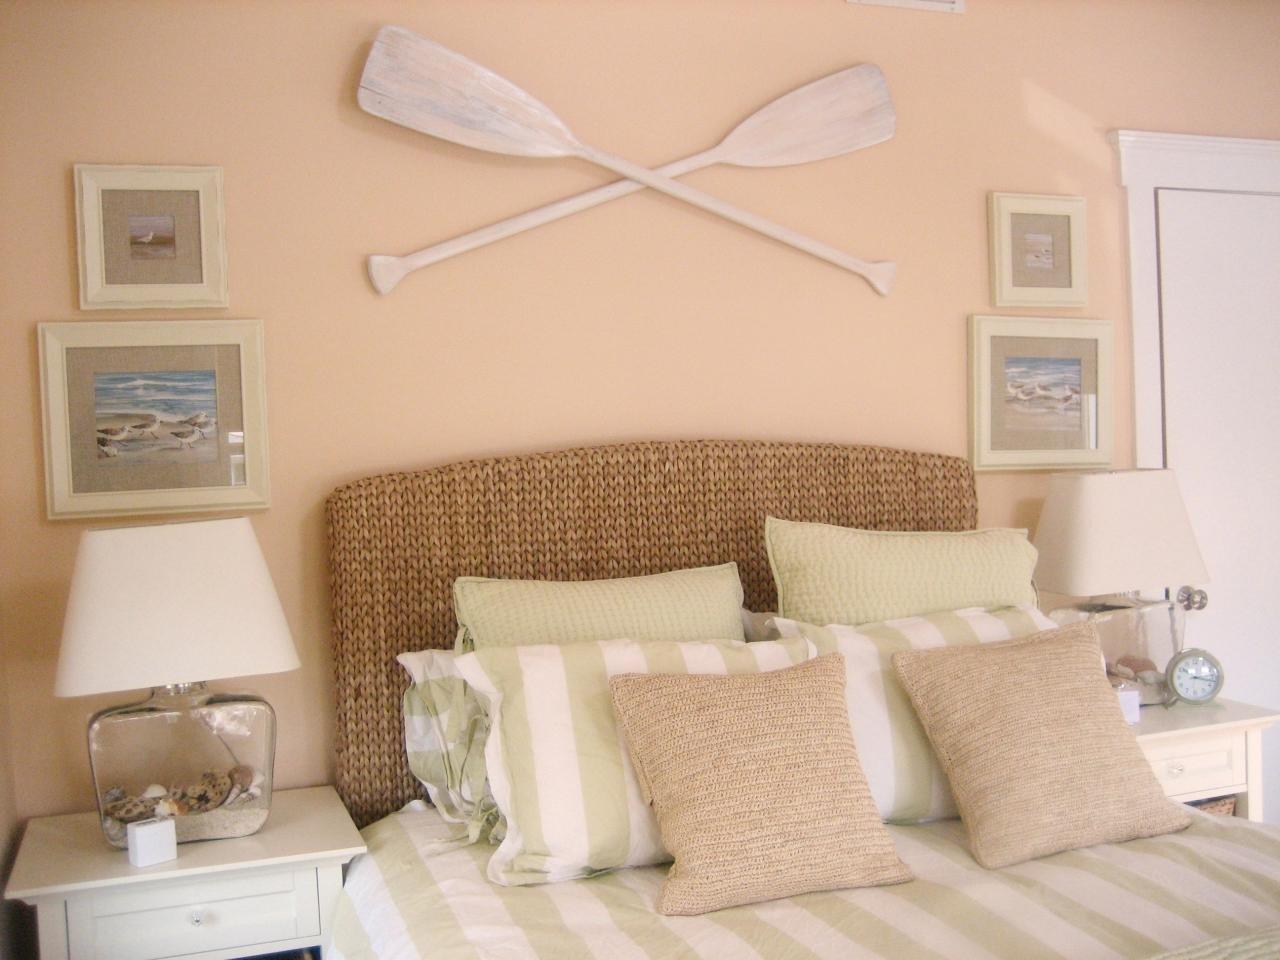 Beach Wall Decor for Bedroom Best Of Coastal Decorating Ideas Beachfront Bargain Hunt